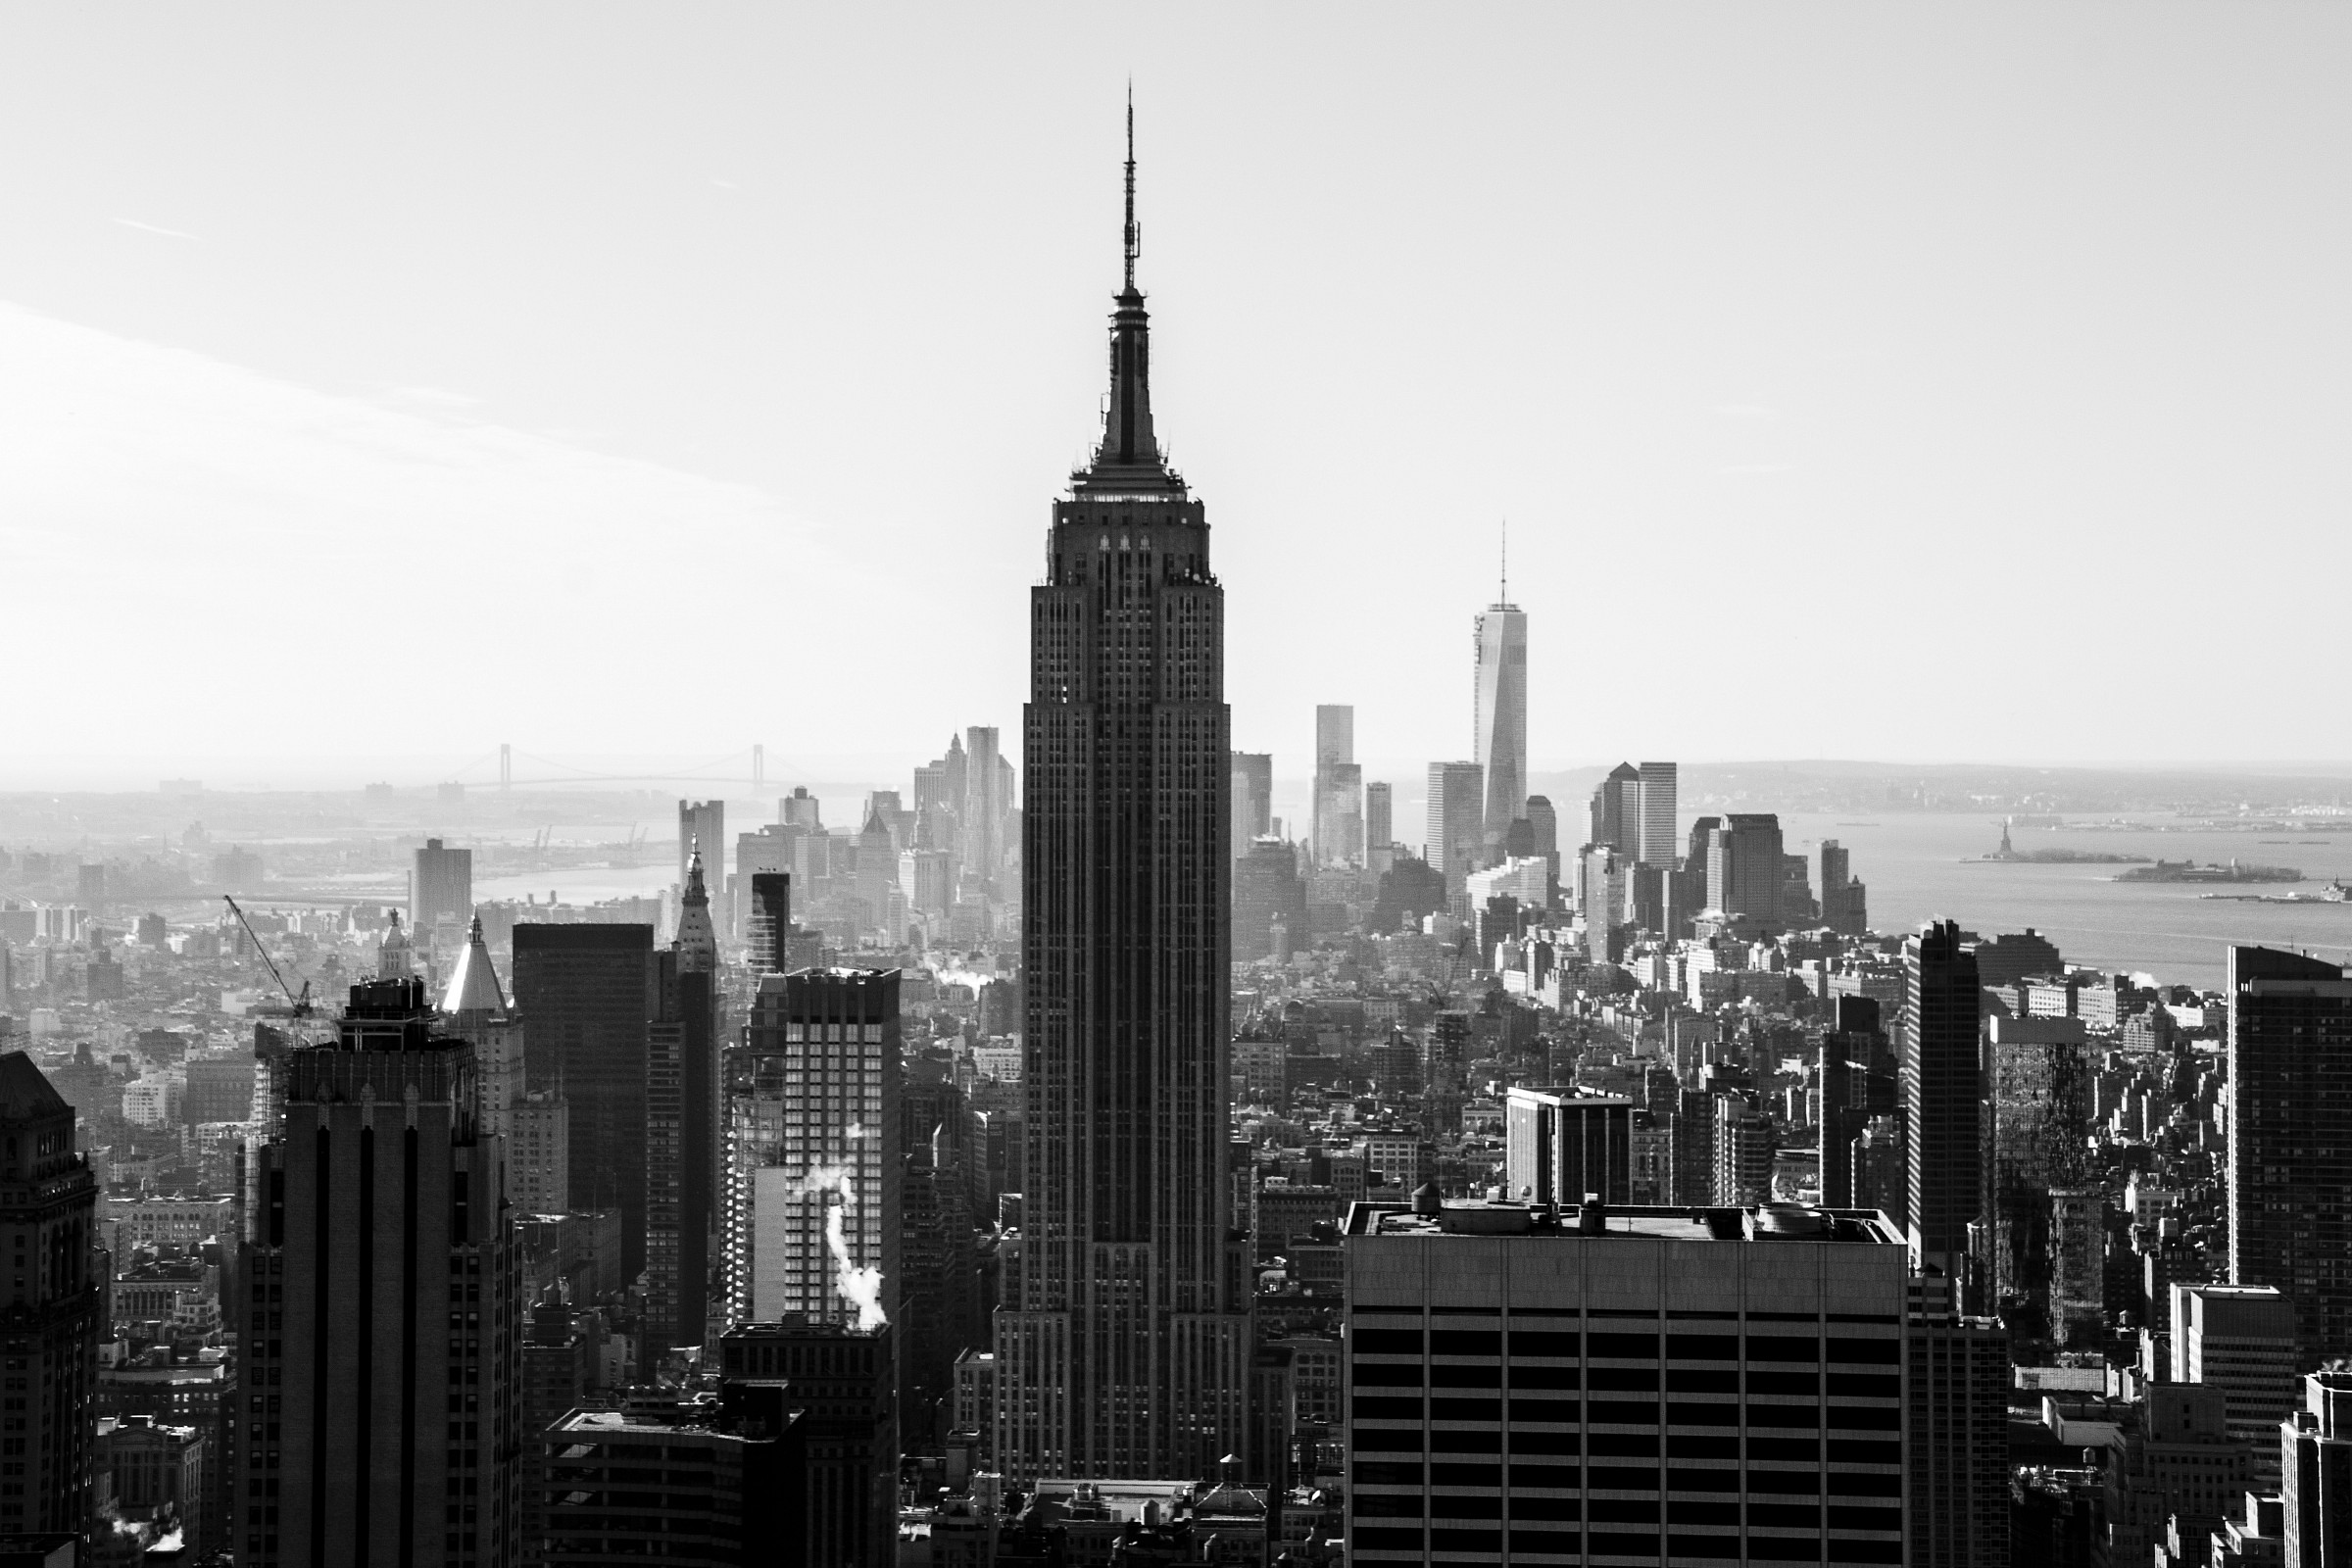 Empire State Building from Rockefeller Center BW...